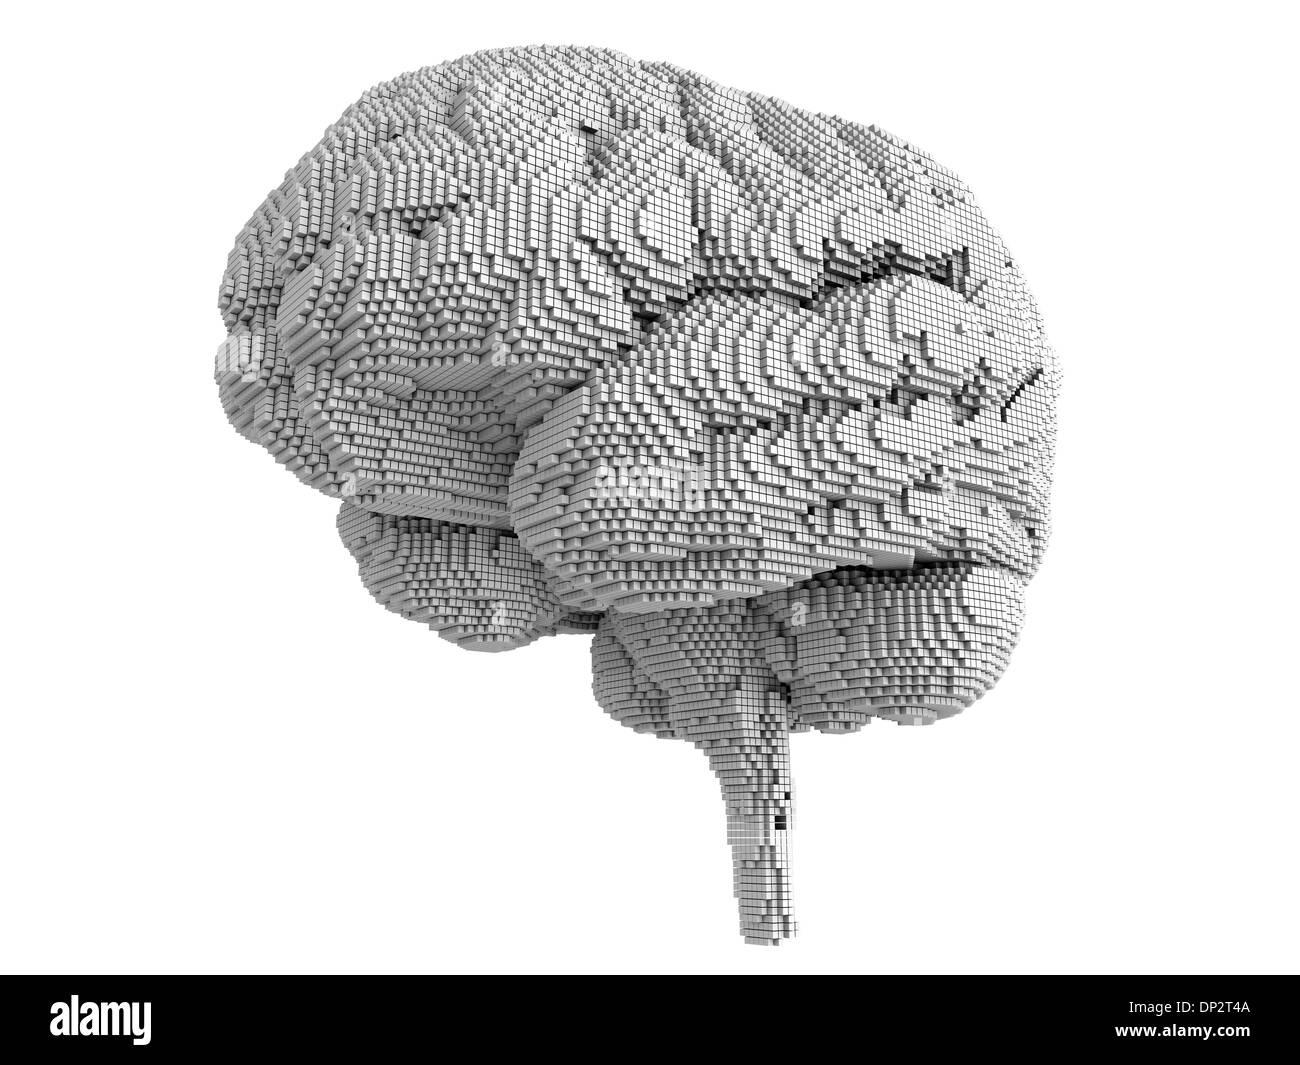 Brain pixelated, artwork - Stock Image